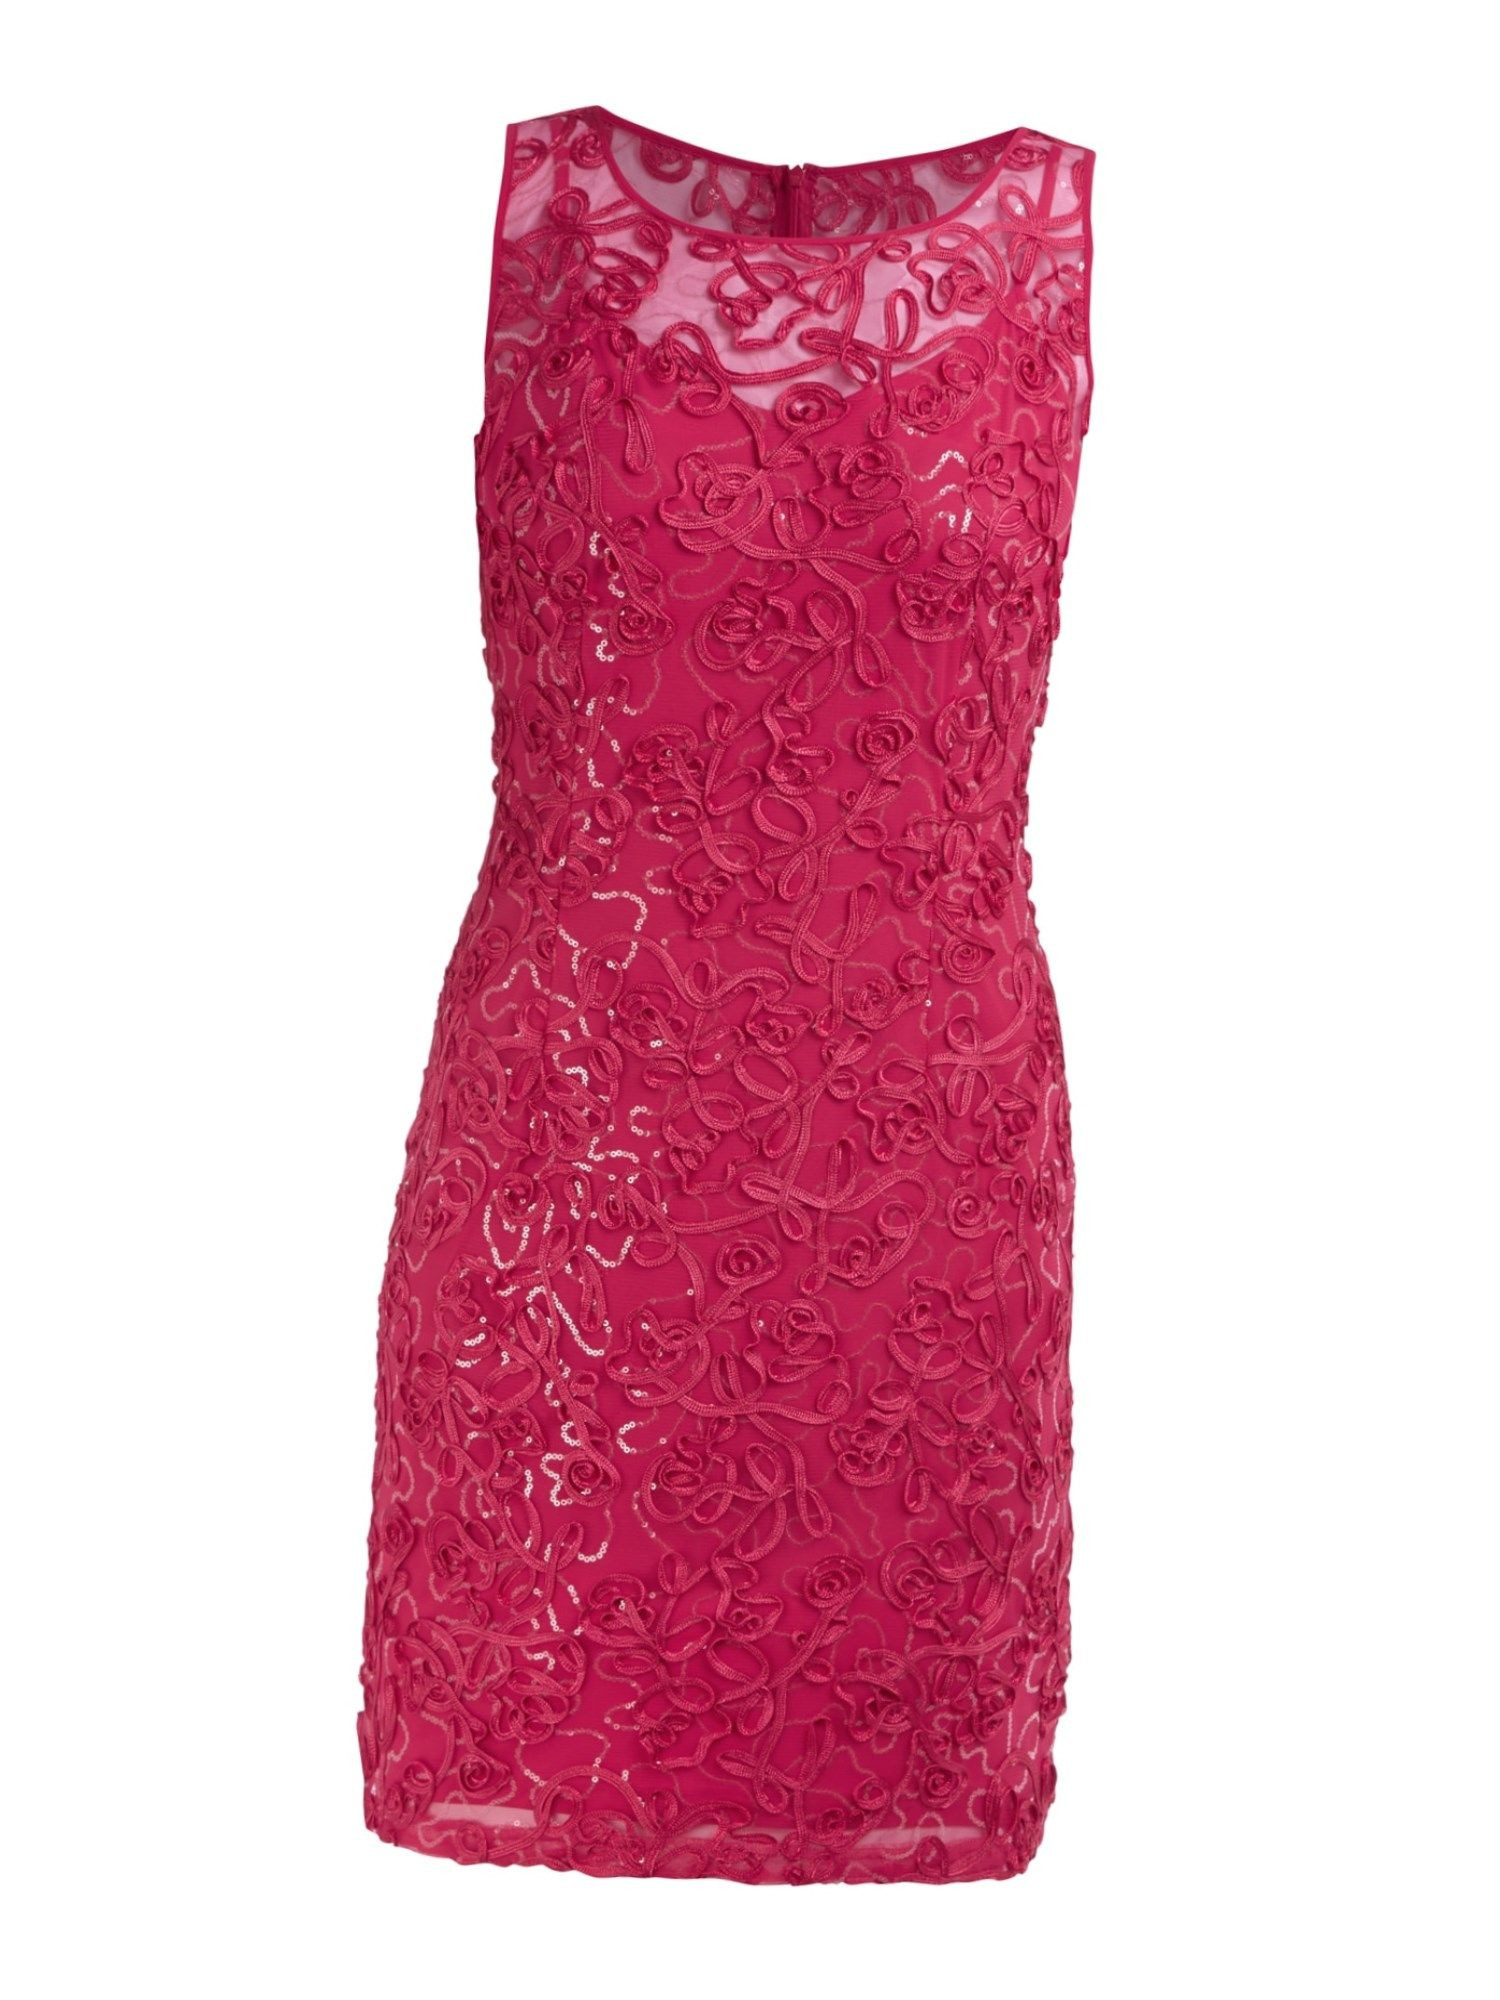 20 Elegant S Oliver Abendkleider Ärmel10 Fantastisch S Oliver Abendkleider Spezialgebiet